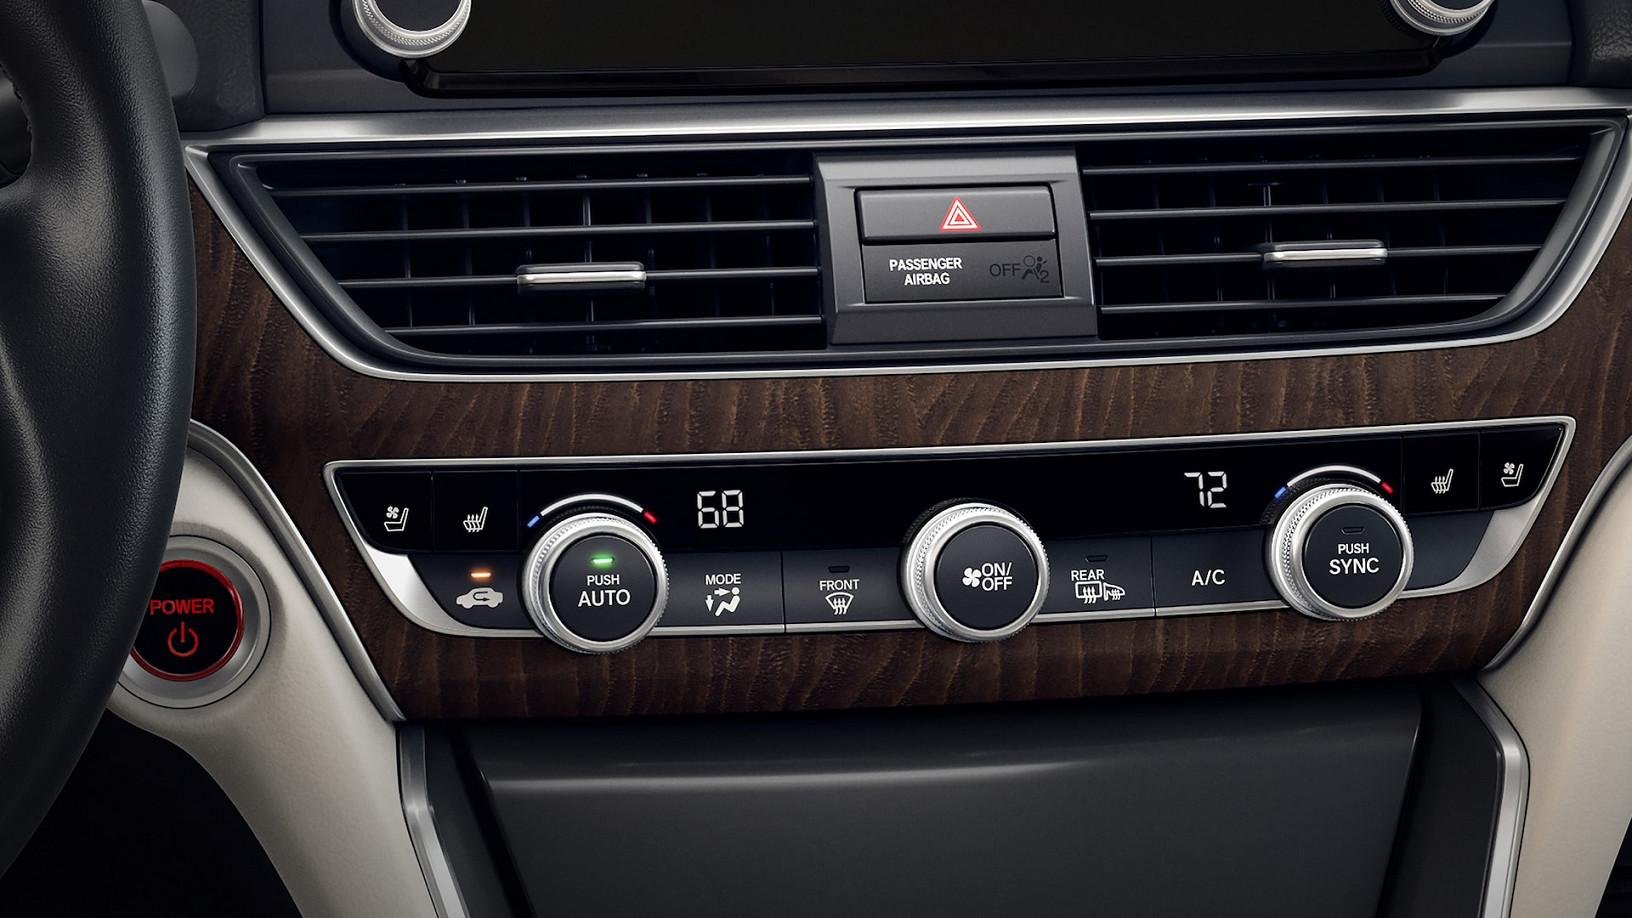 2020 Honda Accord Standard Dual-Zone Climate Control